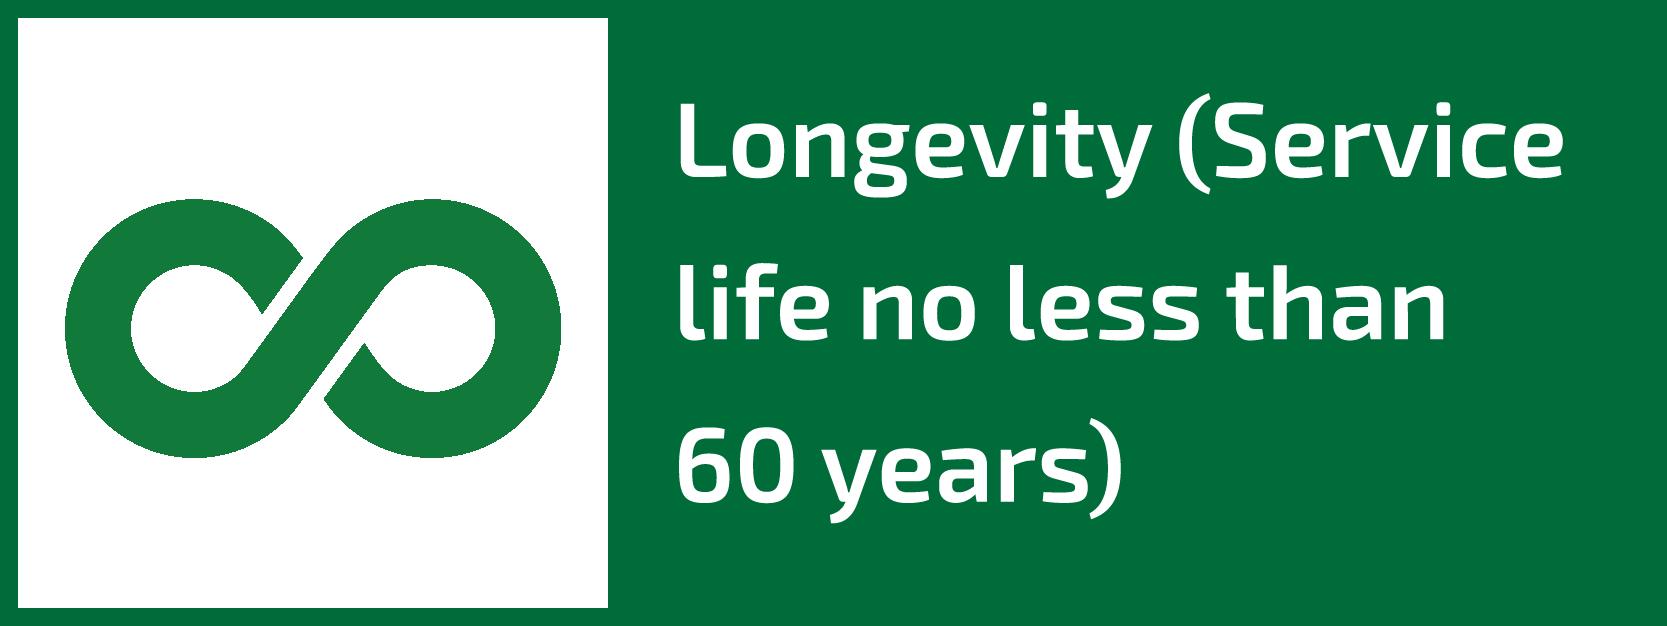 Longevity.png